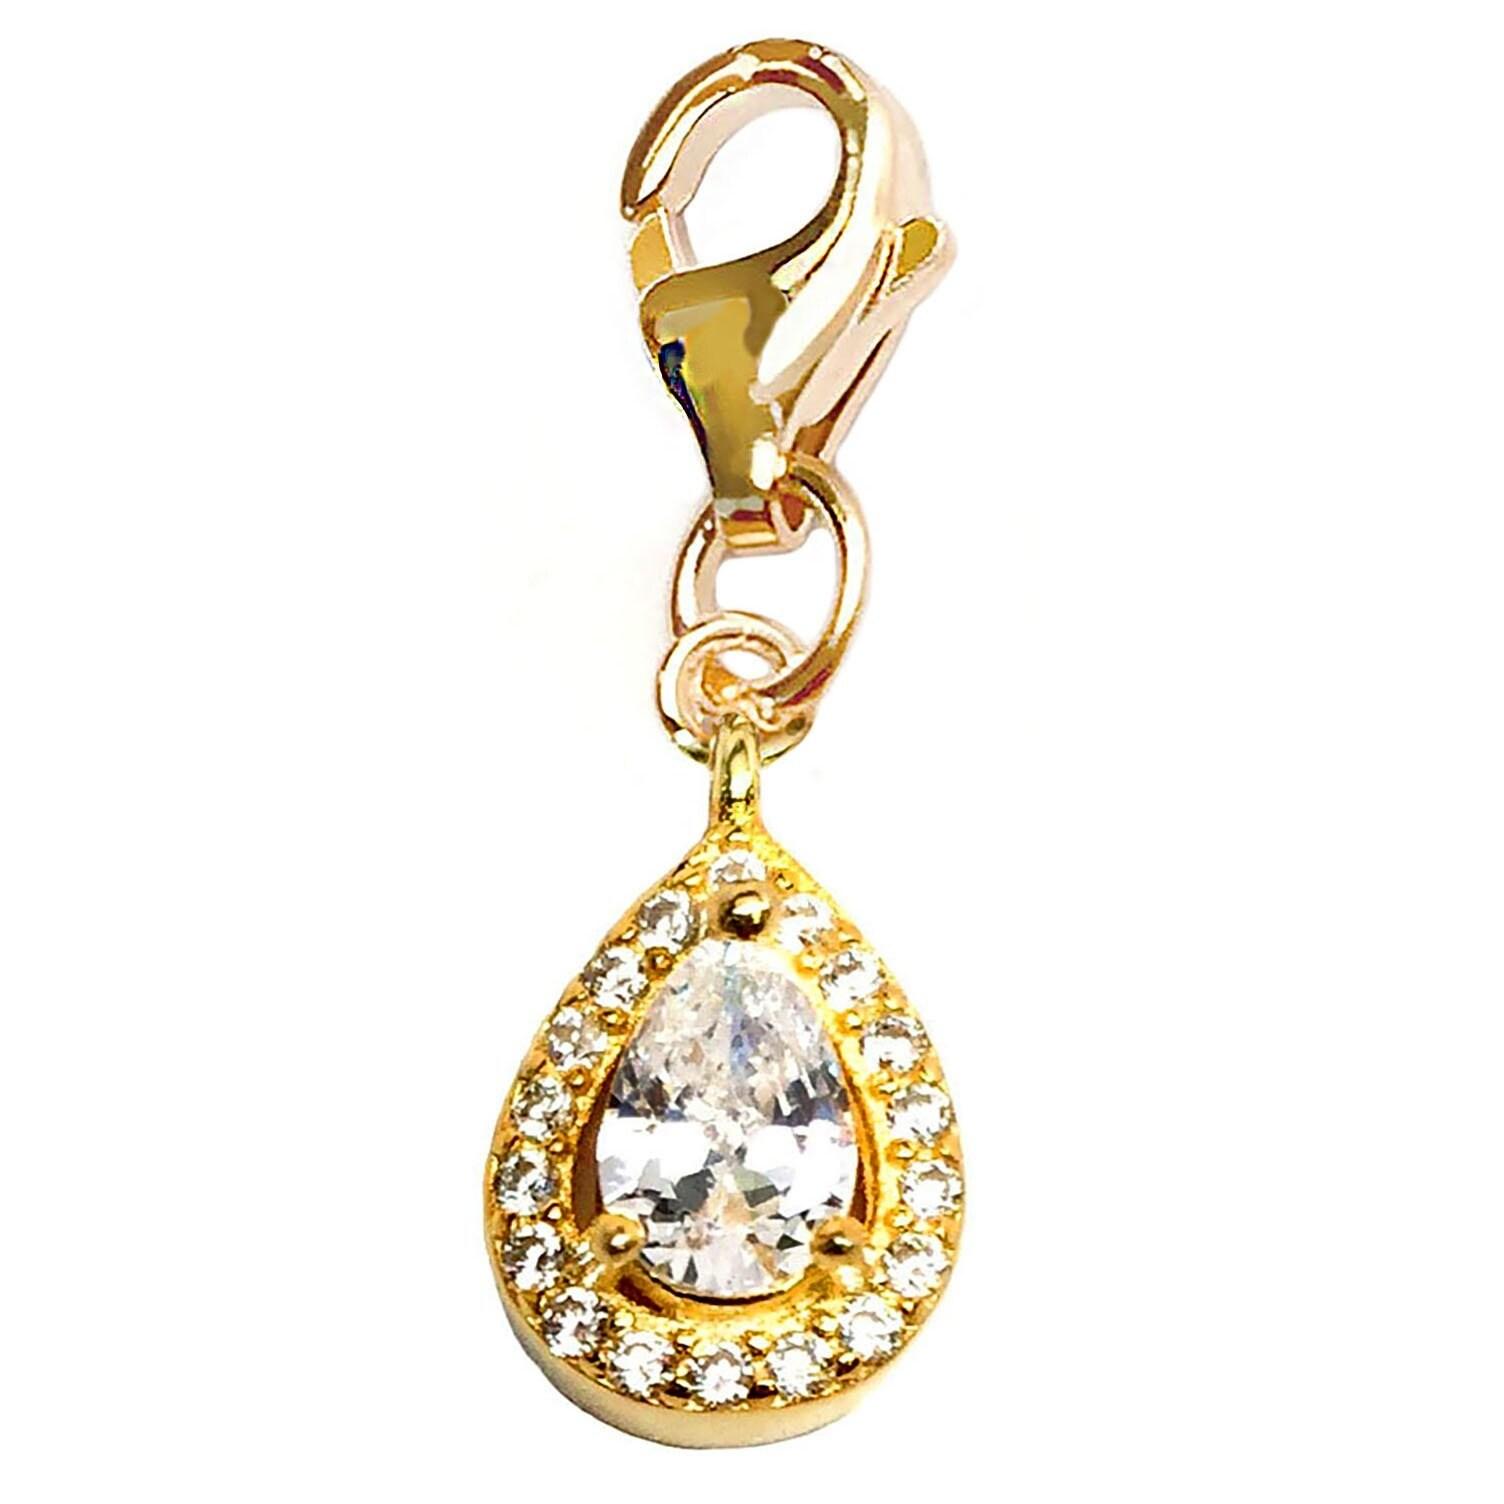 Julieta Jewelry Teardrop Clip-On Charm - Thumbnail 0